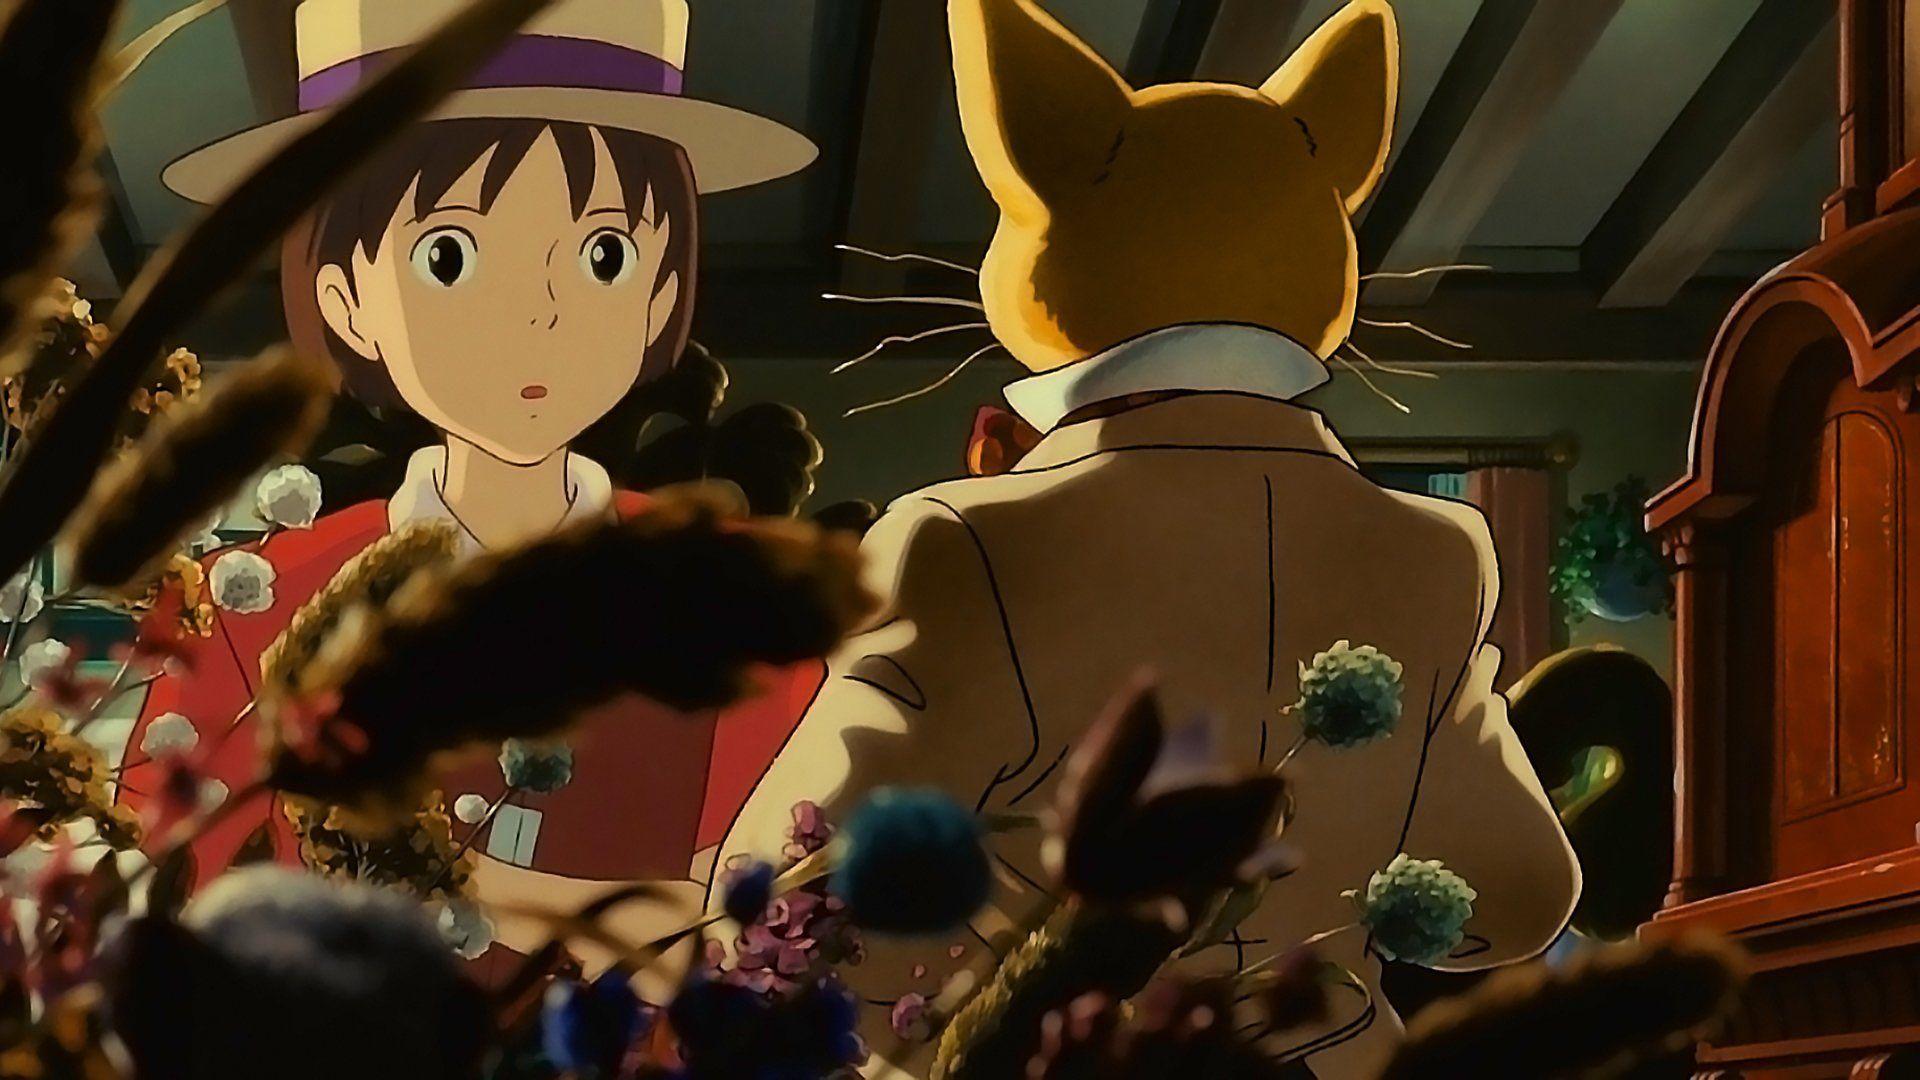 Studio Ghibli On 2020 壁紙 ジブリ ジブリ 漫画イラスト